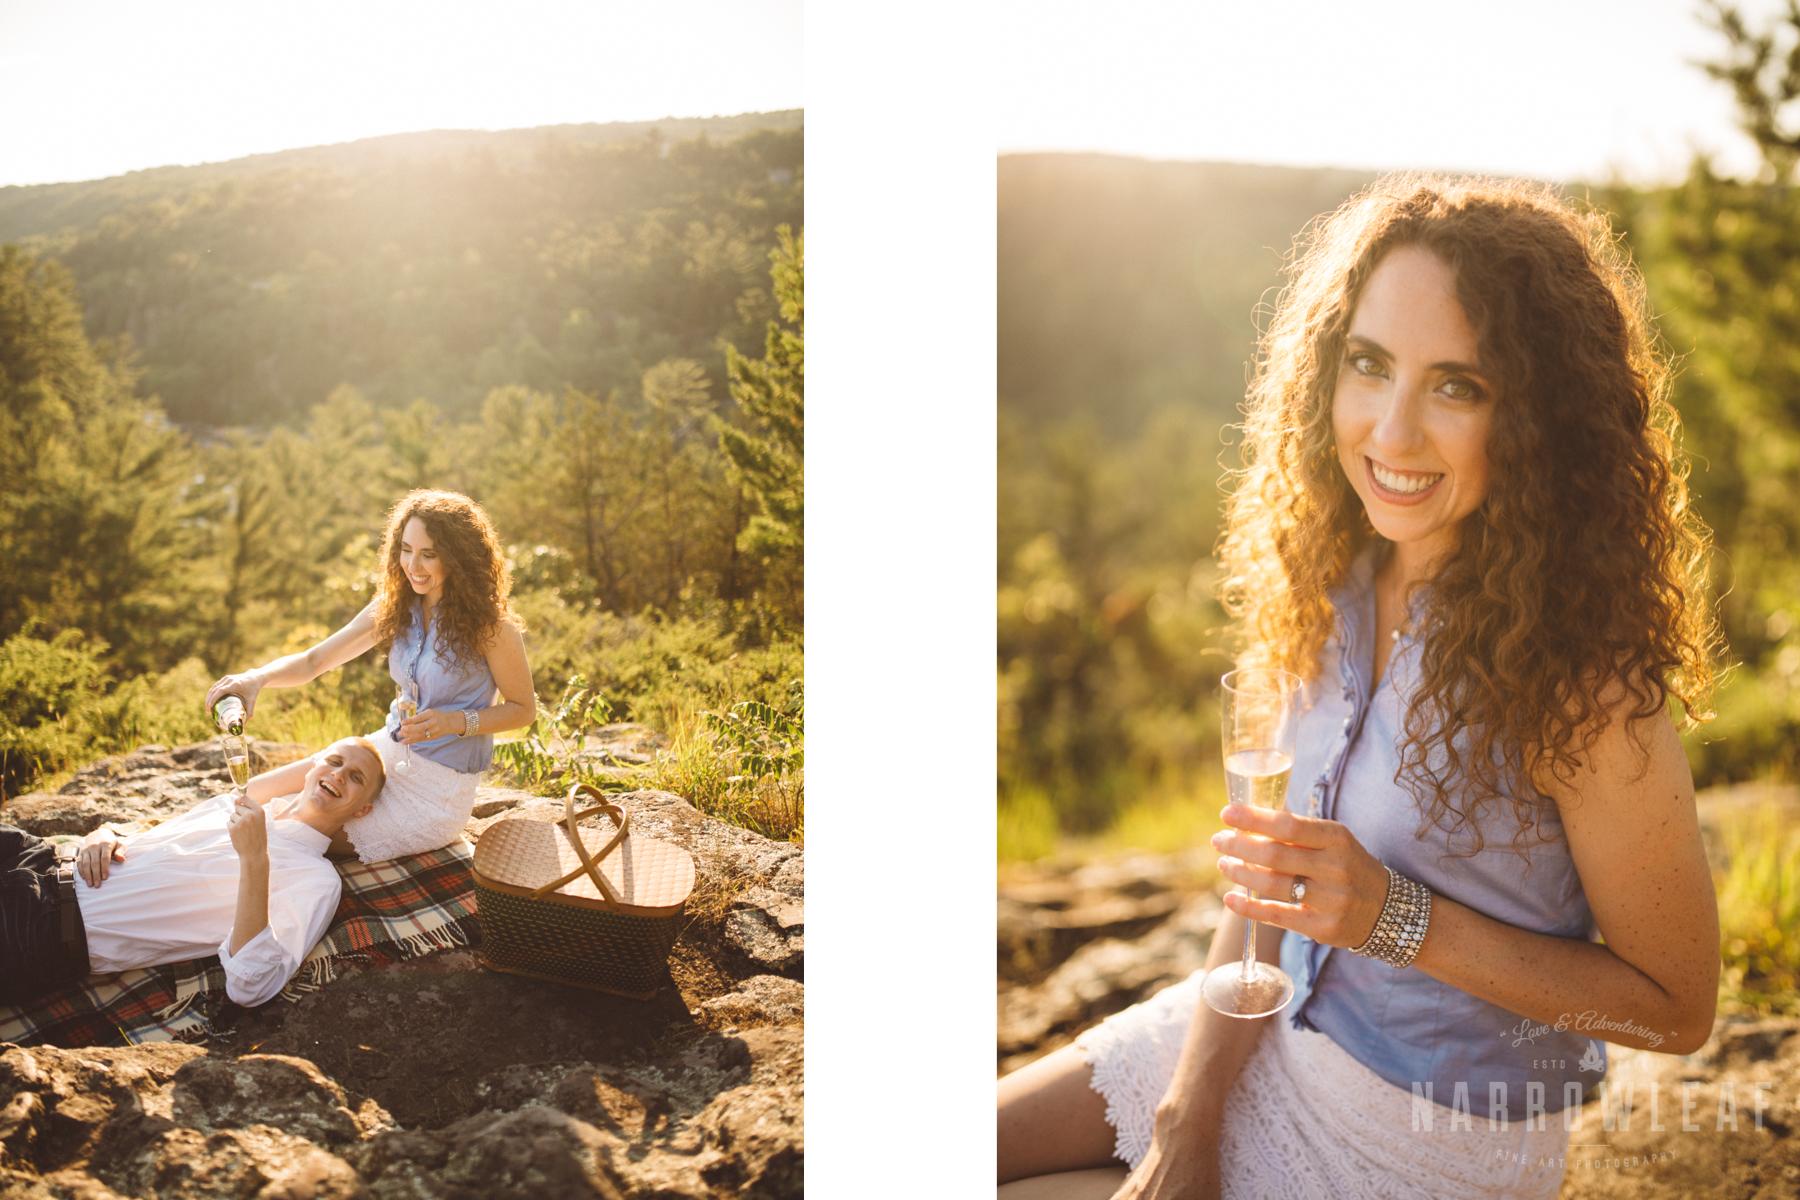 NarrowLeaf_Love_&_Adventure_Photography-champagne-toast.jpg